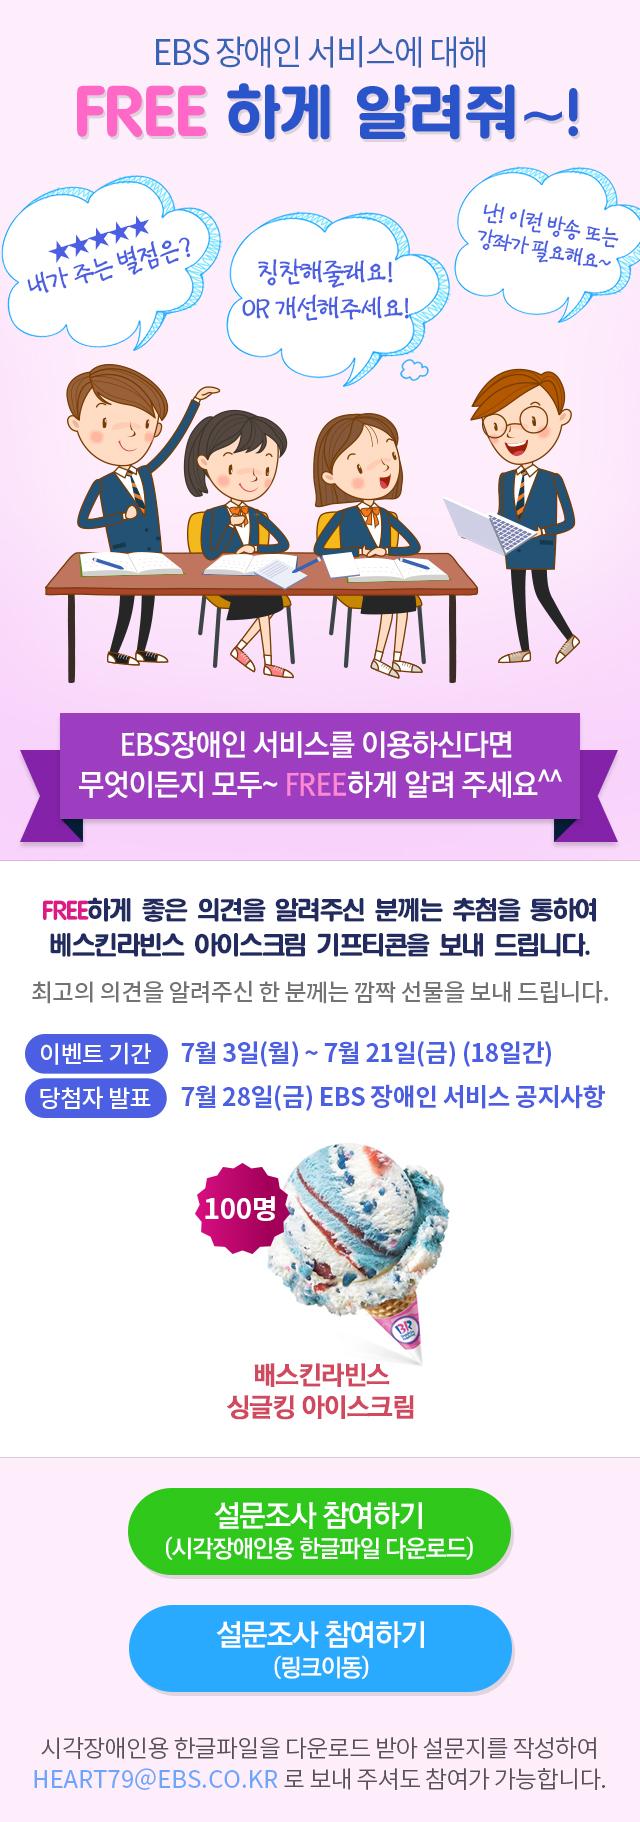 EBS 장애인 서비스에 대해 FREE 하게 알려줘~!